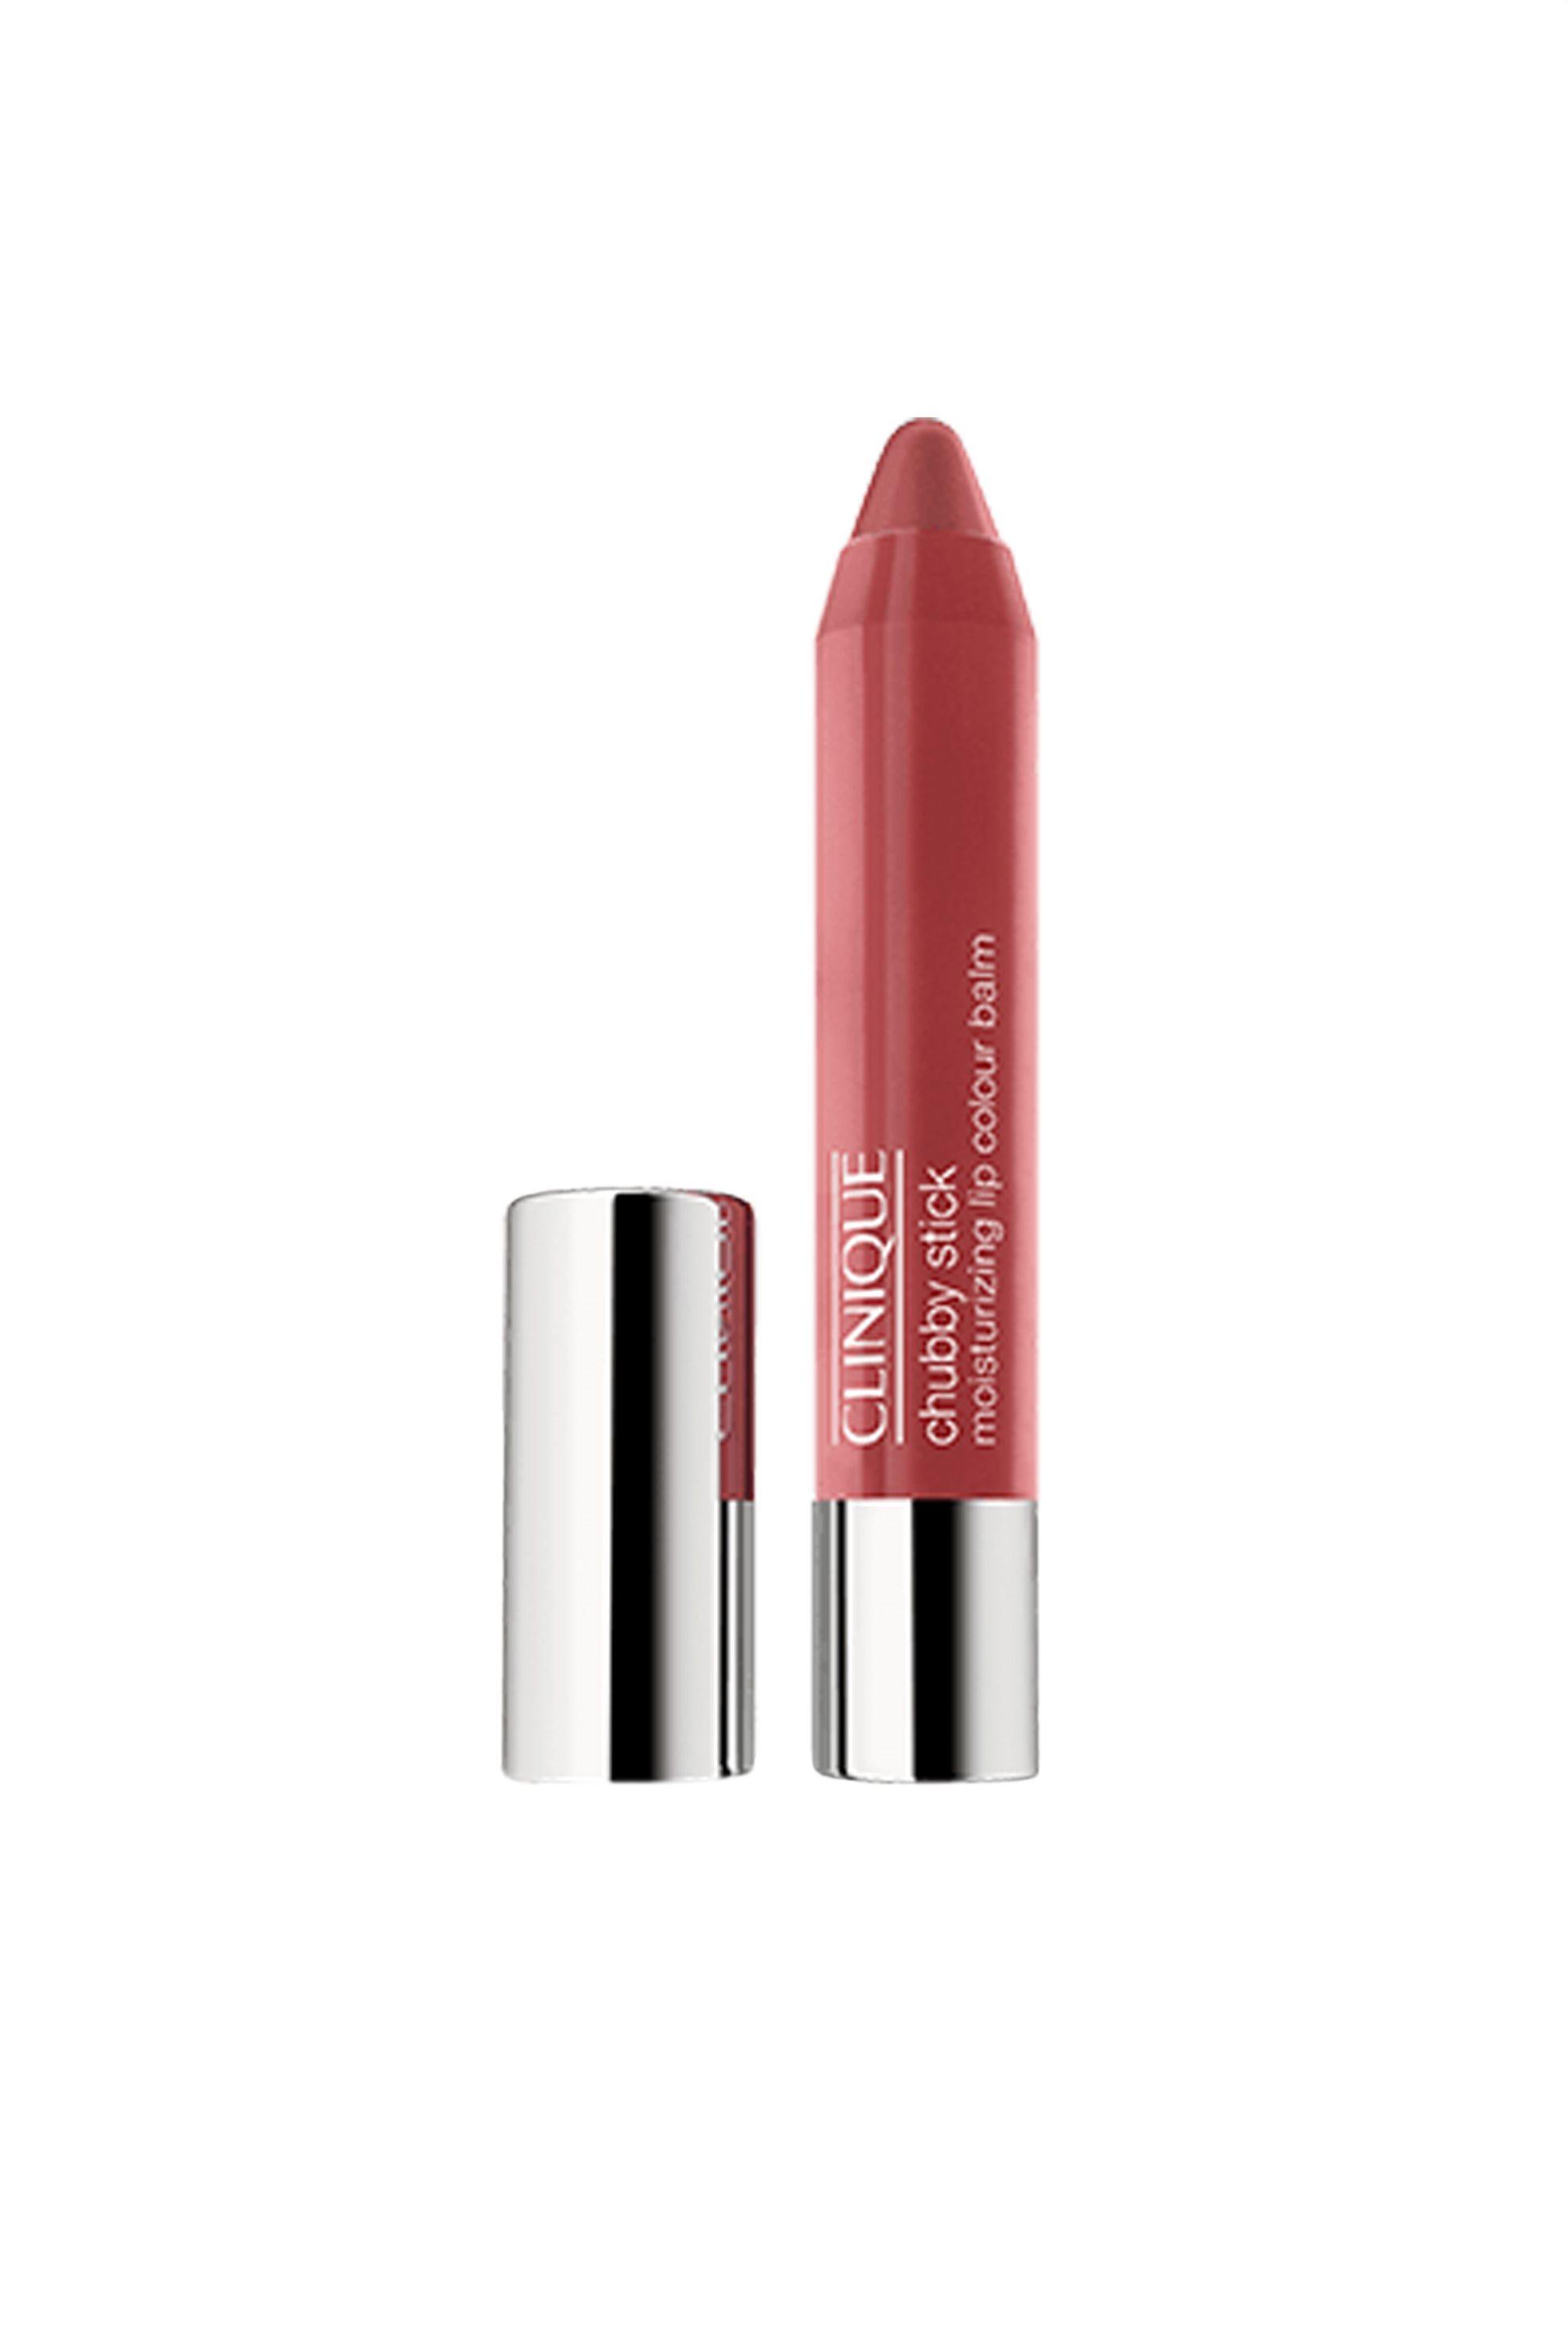 Clinique Chubby Stick™ Moisturizing Lip Colour Balm 04 Mega Melon 3 gr. - 749K04 ομορφια   καλλυντικα επιλεκτικησ   μακιγιάζ   χείλη   lip gloss   balms